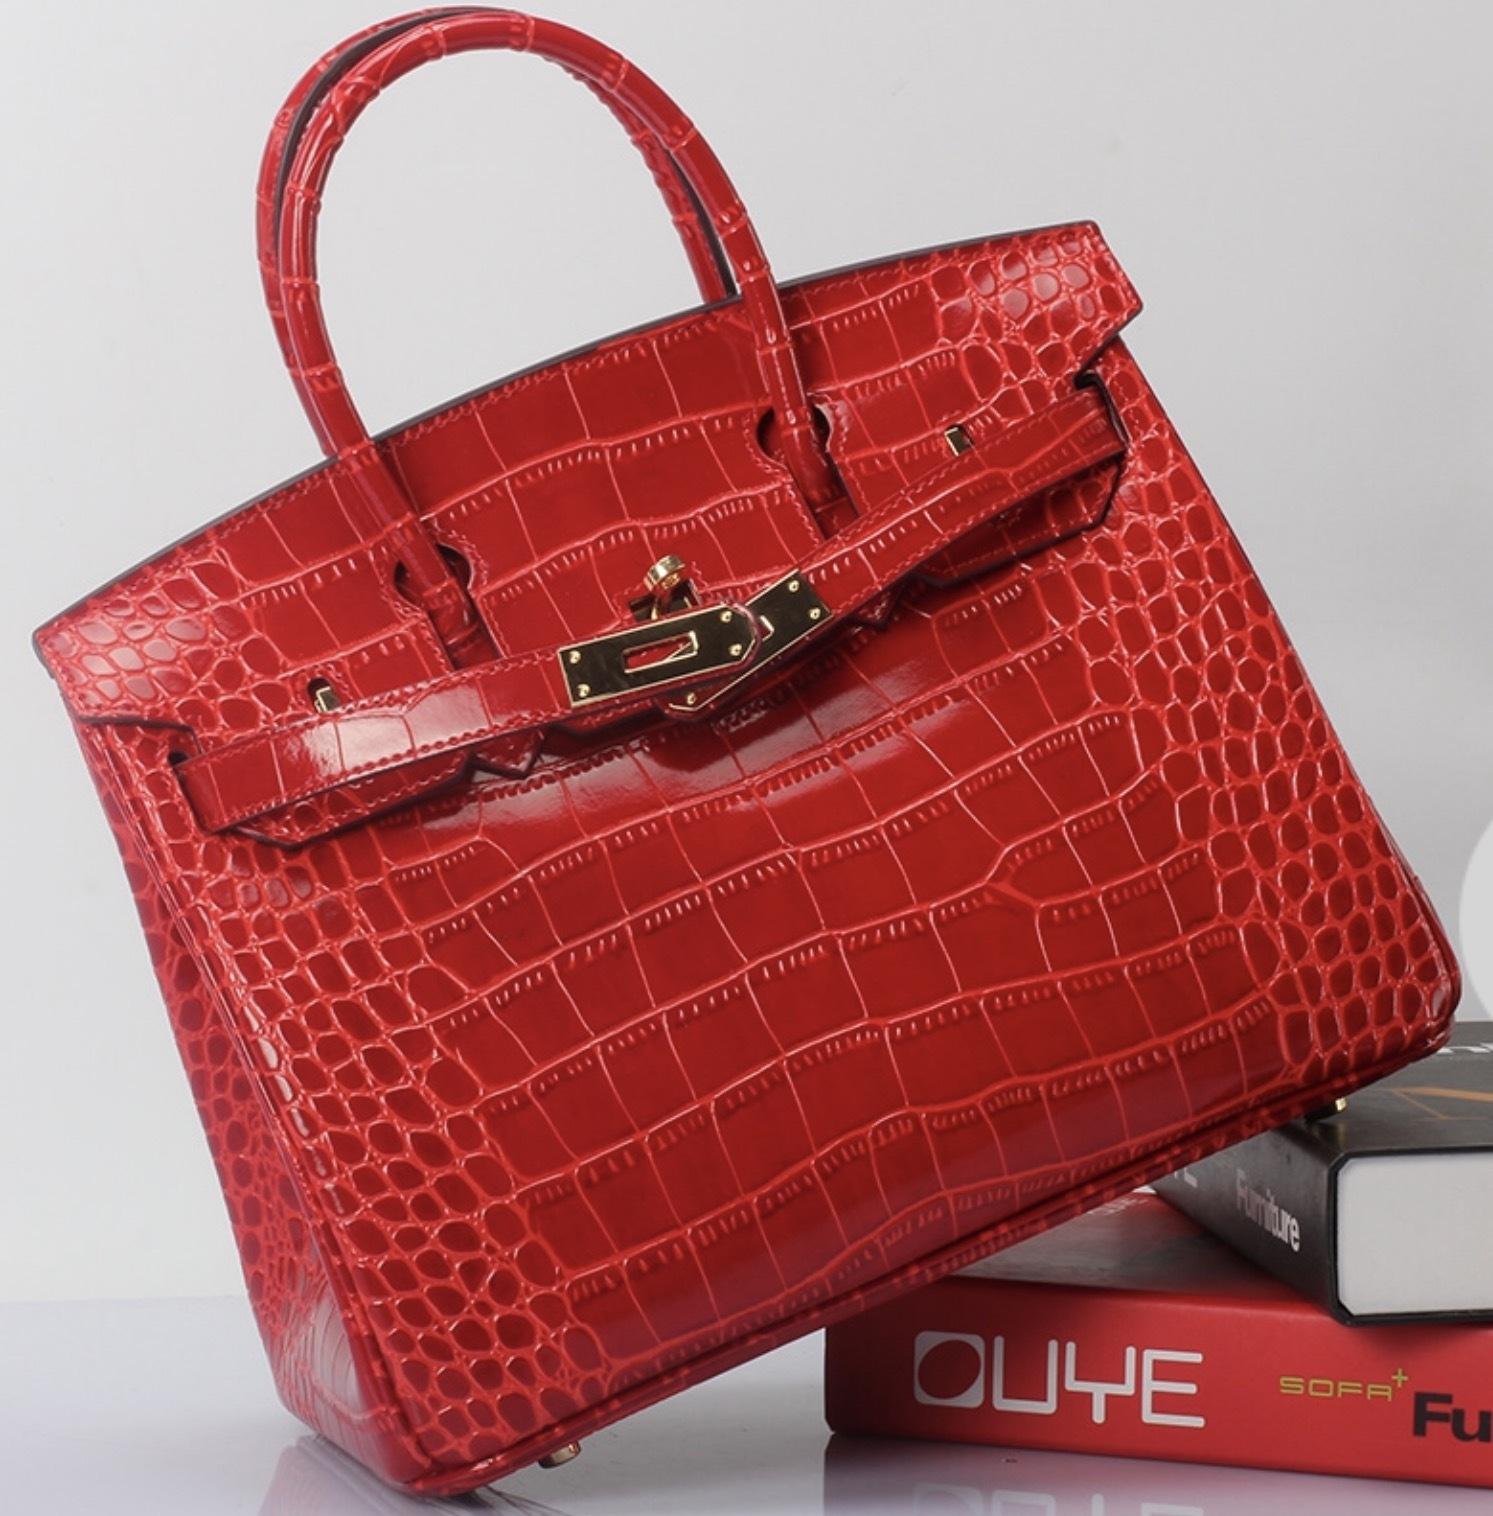 35cm Crocodile Pattern Italian Leather Birkin Style Bag Satchel Handbag 1632L